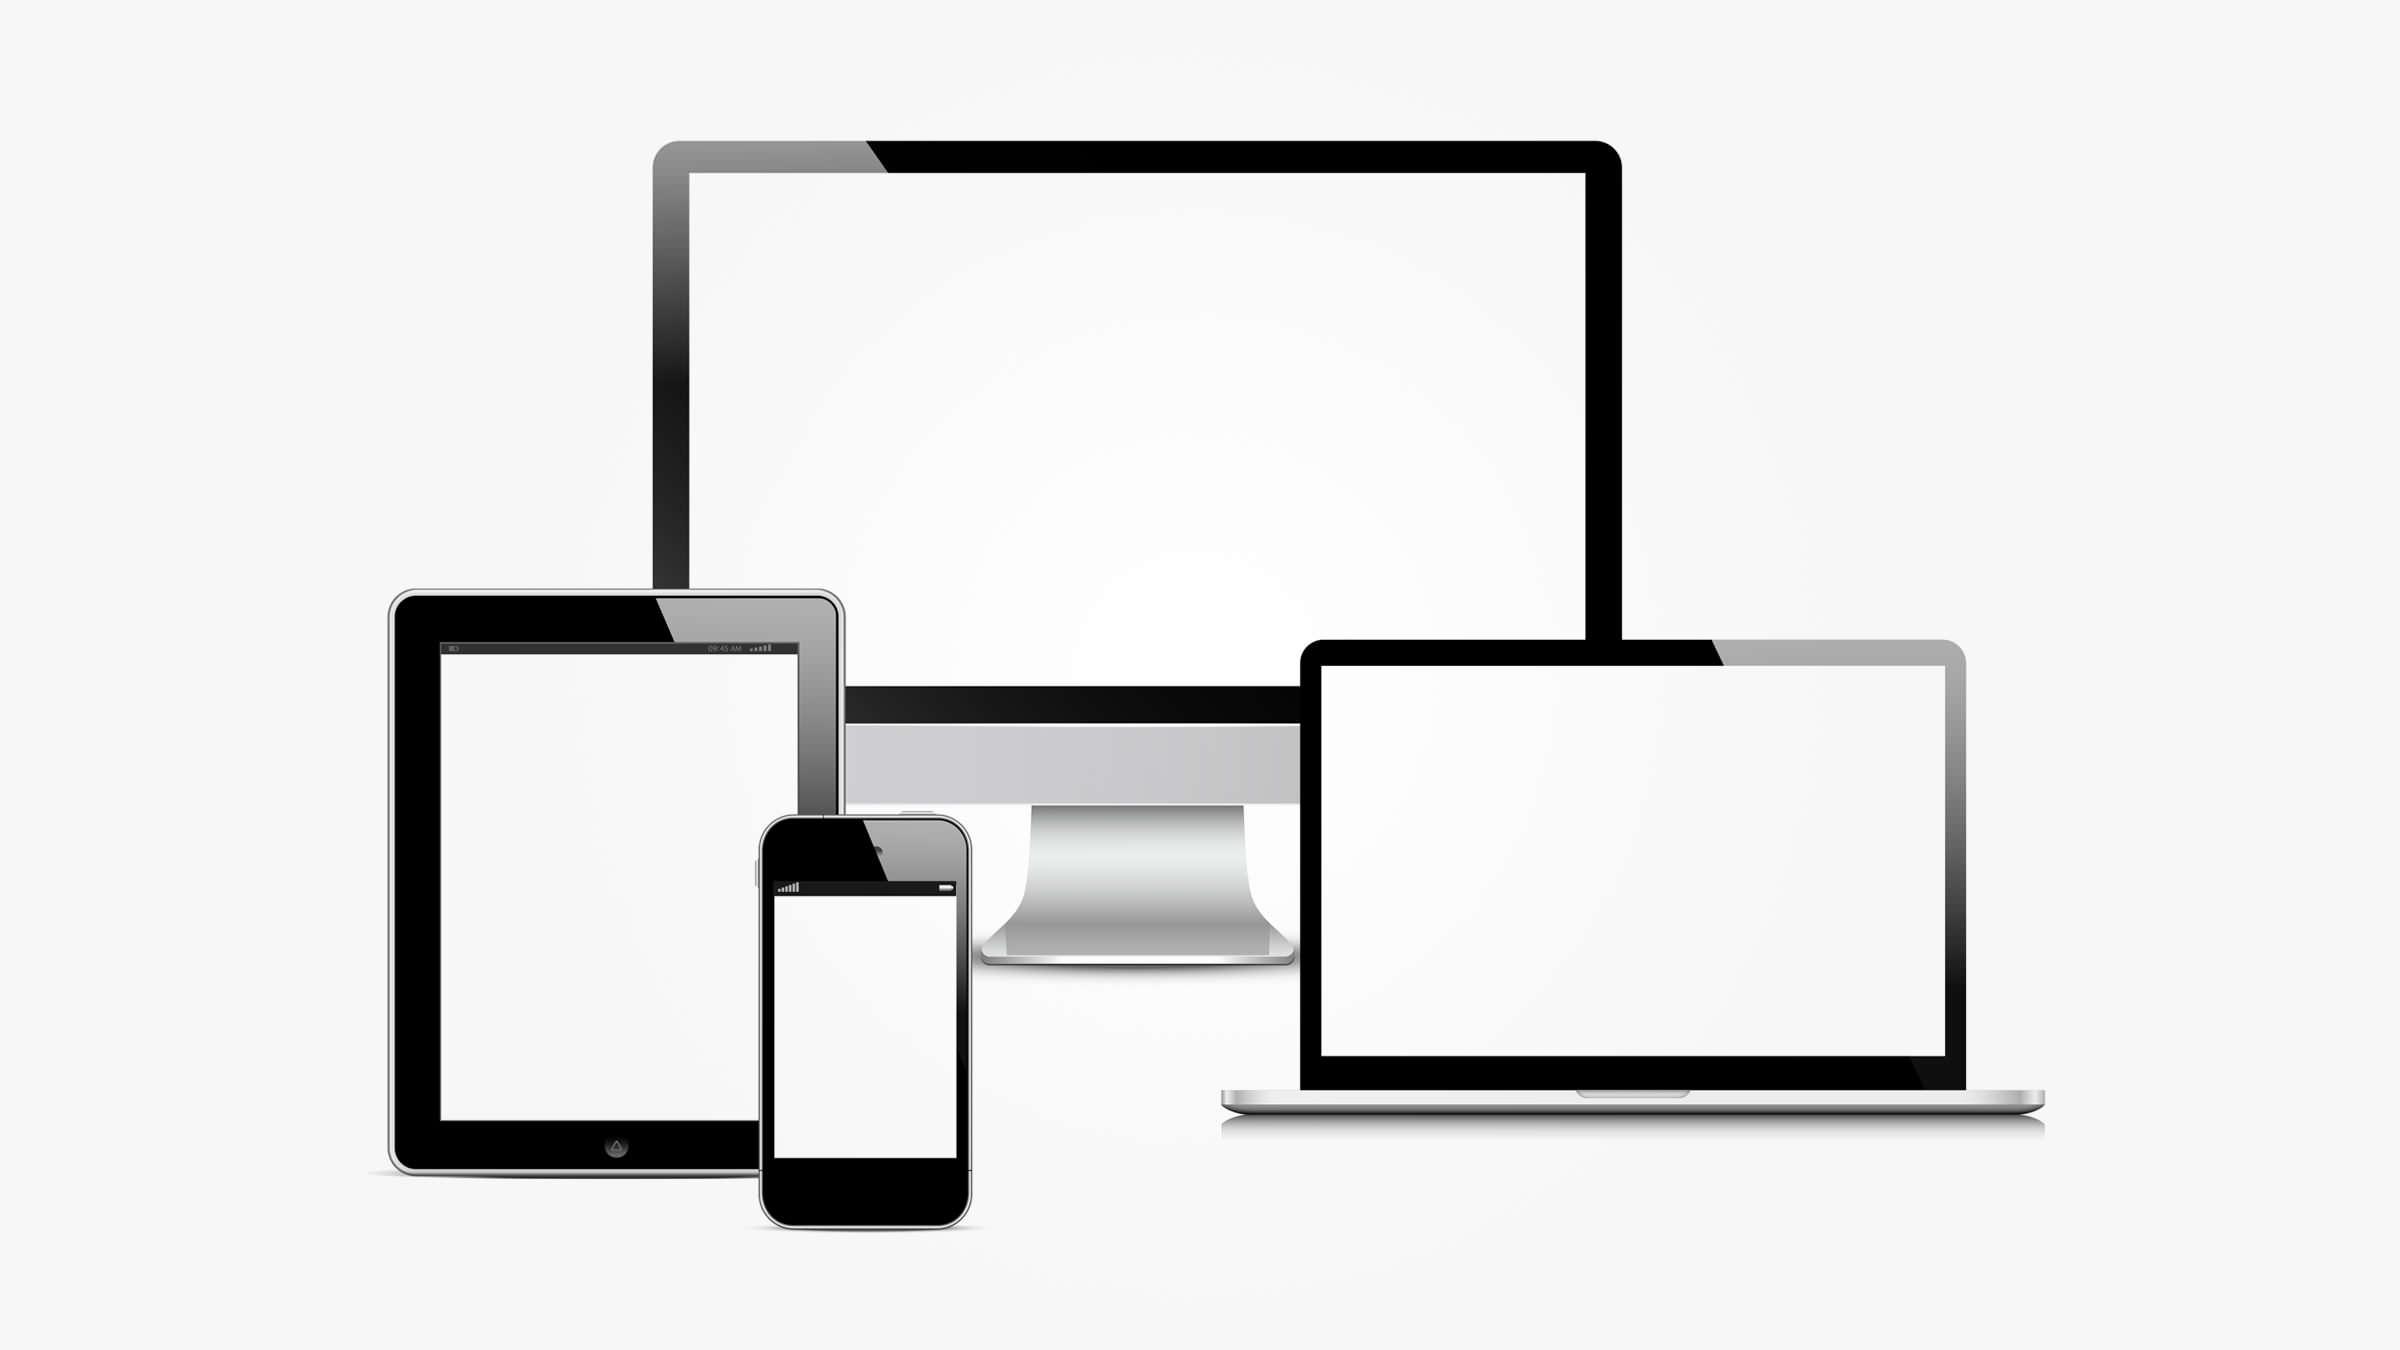 A screenshot showing a visual representation of responsive design.